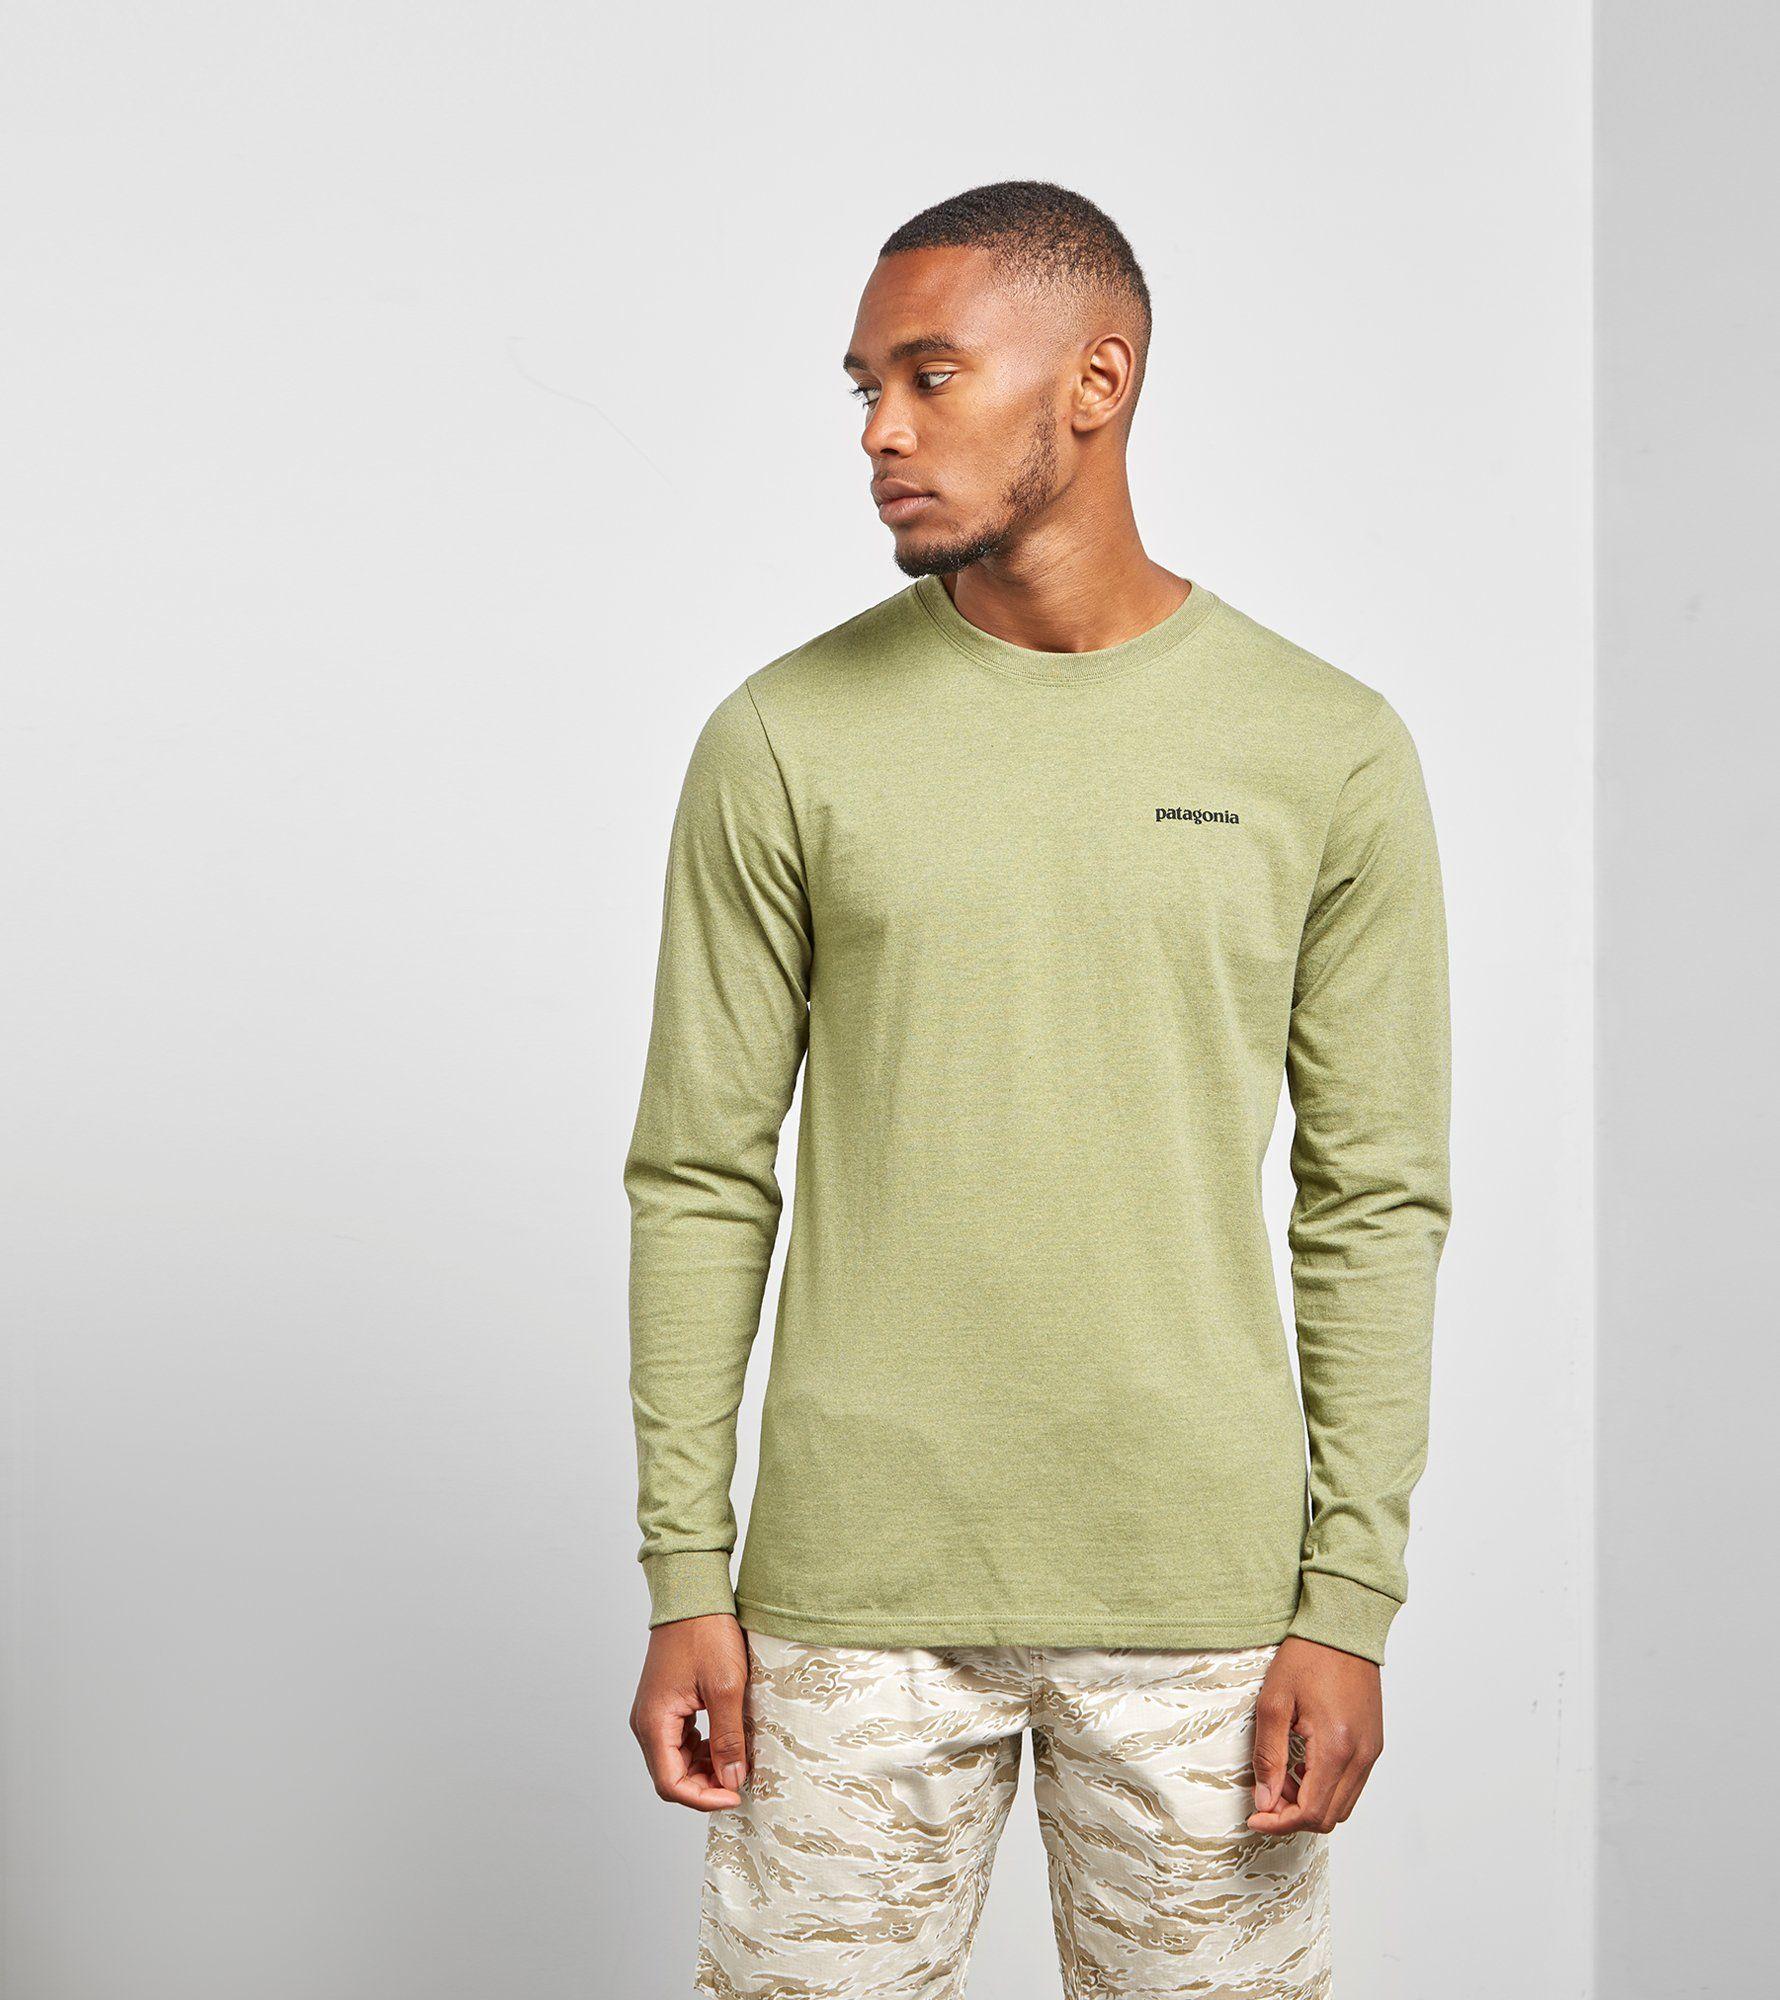 Patagonia Long Sleeved P-6 Responsibili T-Shirt